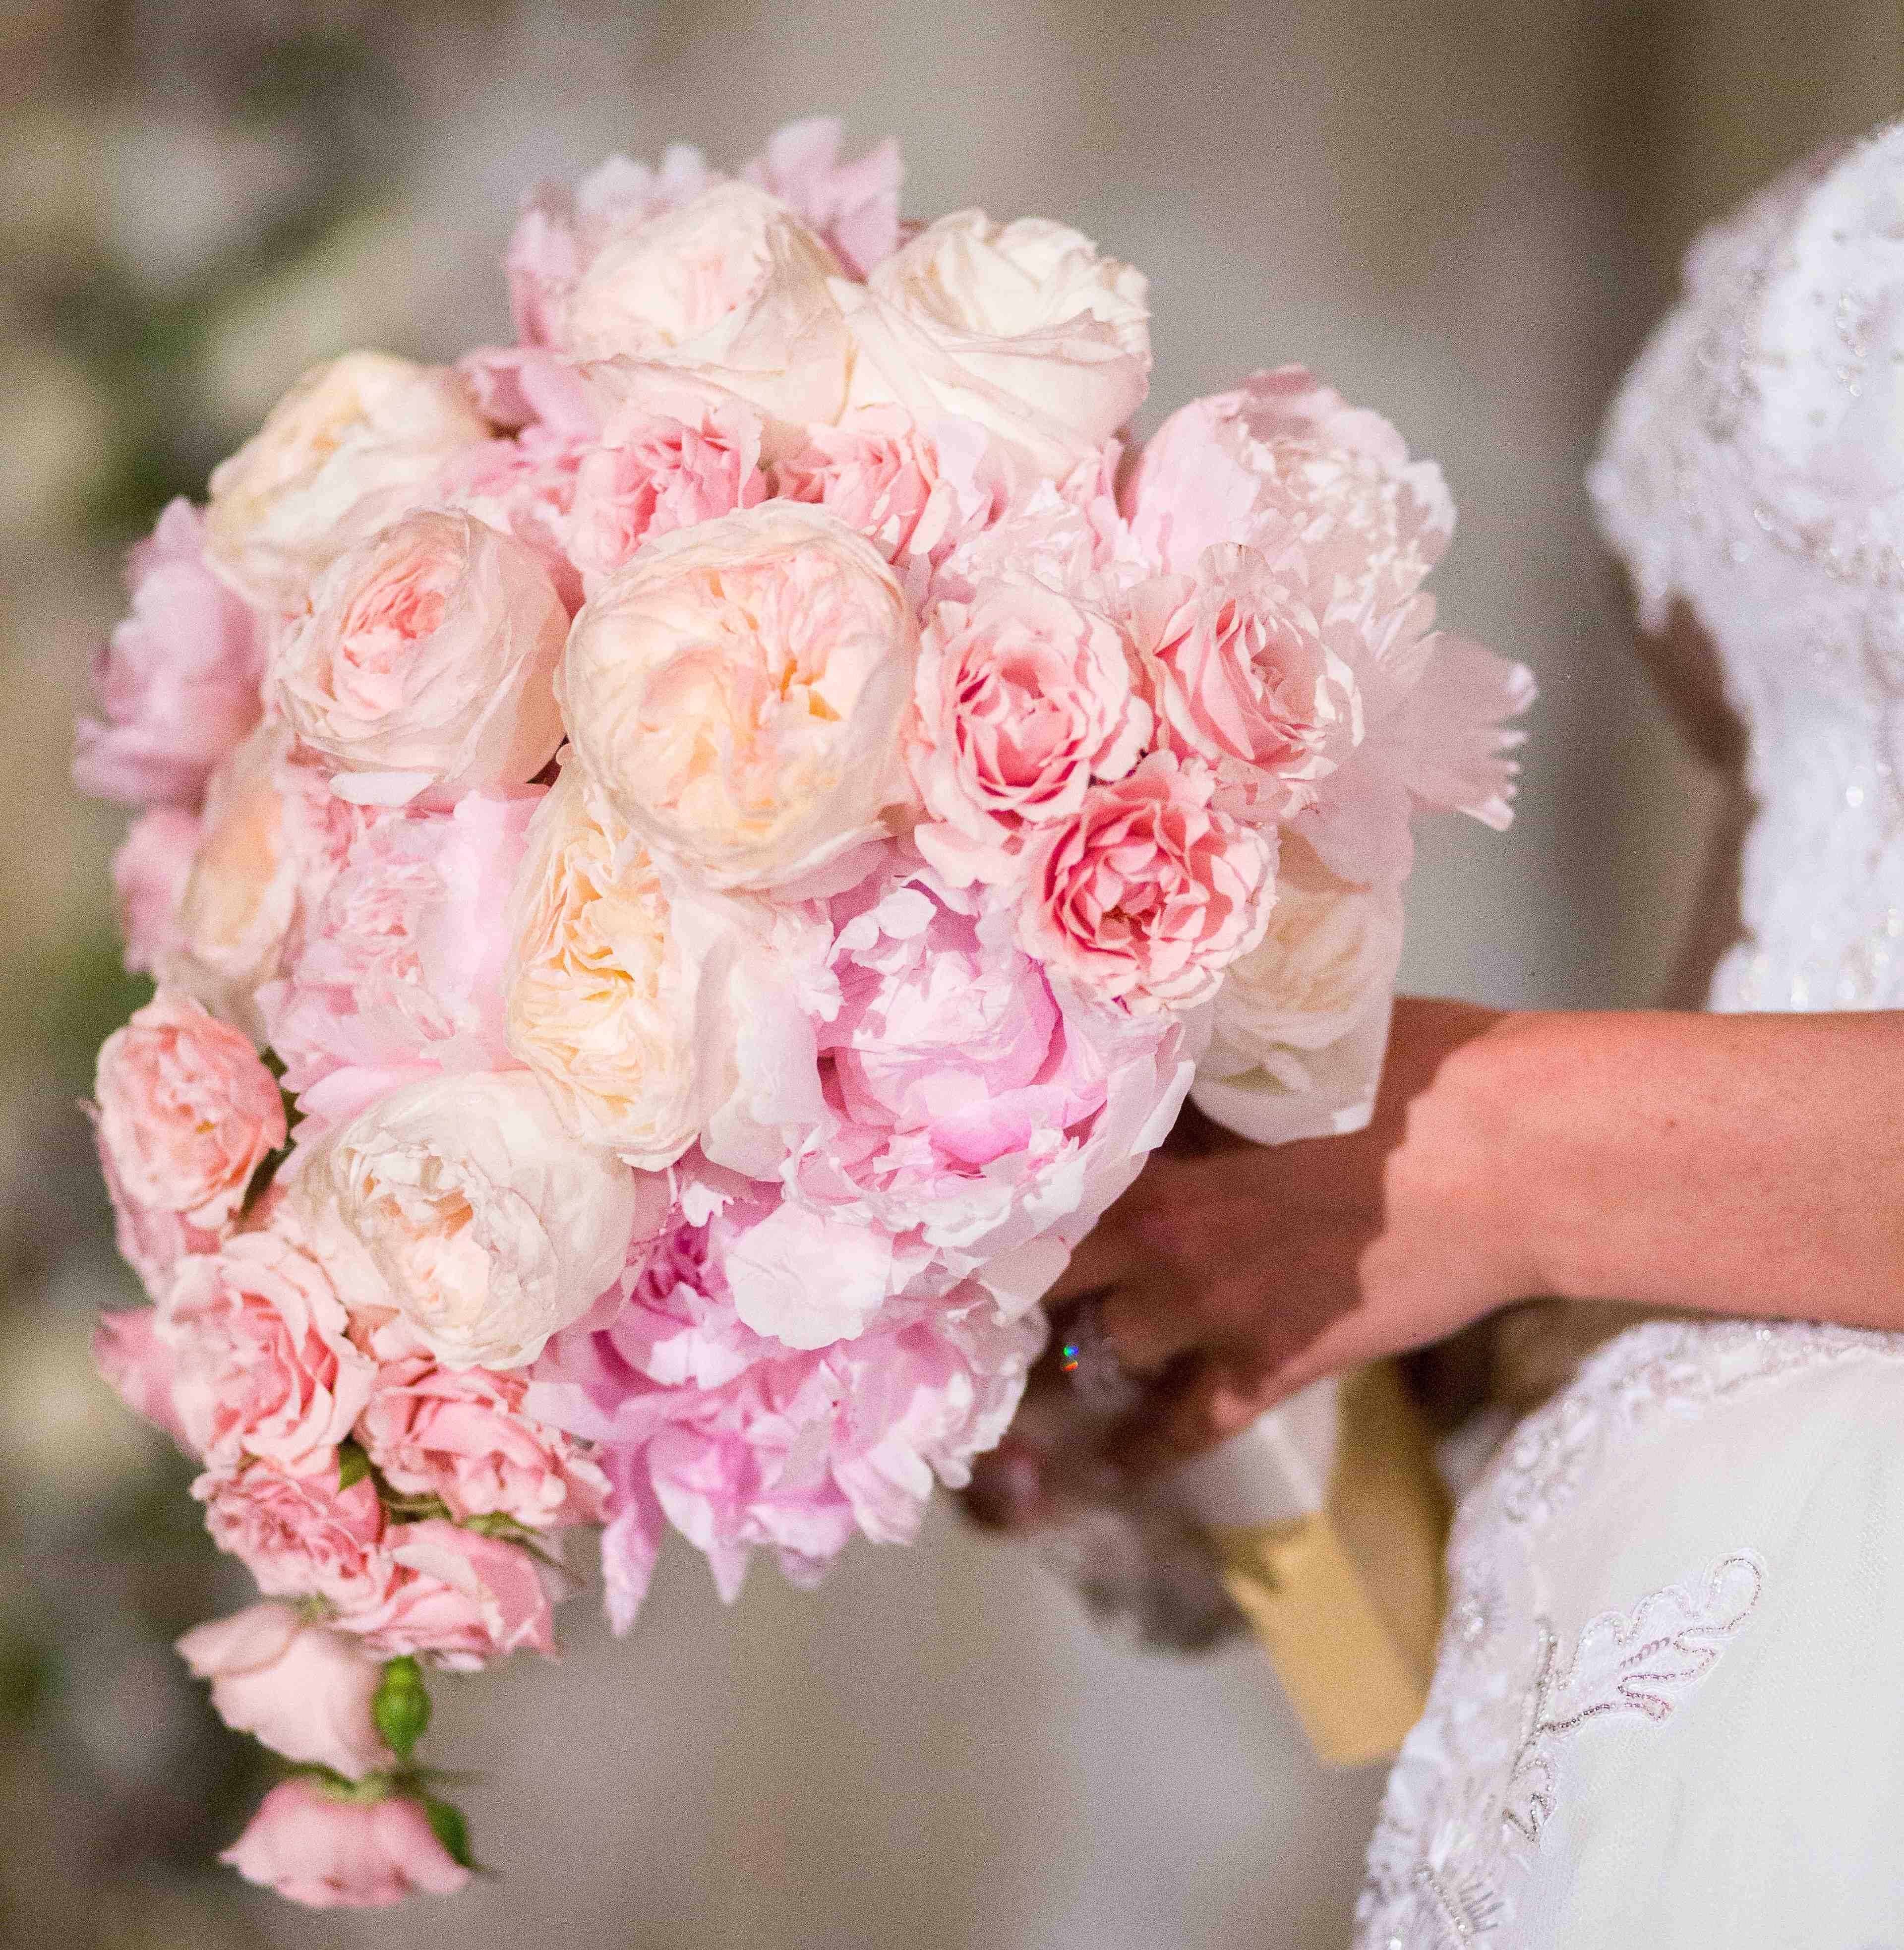 pink peony and garden rose bouquet - Garden Rose Bouquet